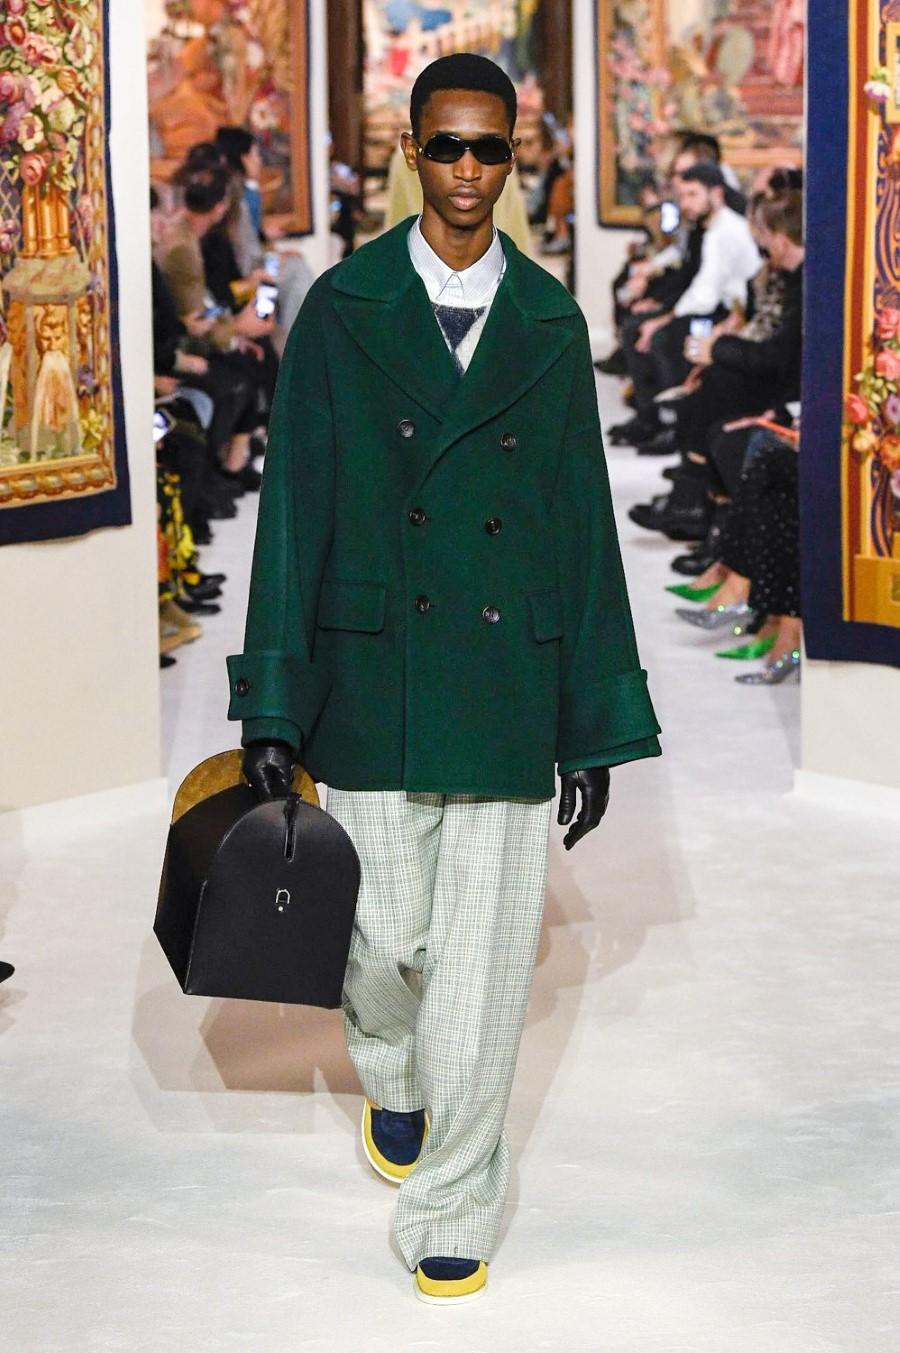 Lanvin - Fall Winter 2020 - Paris Fashion Week